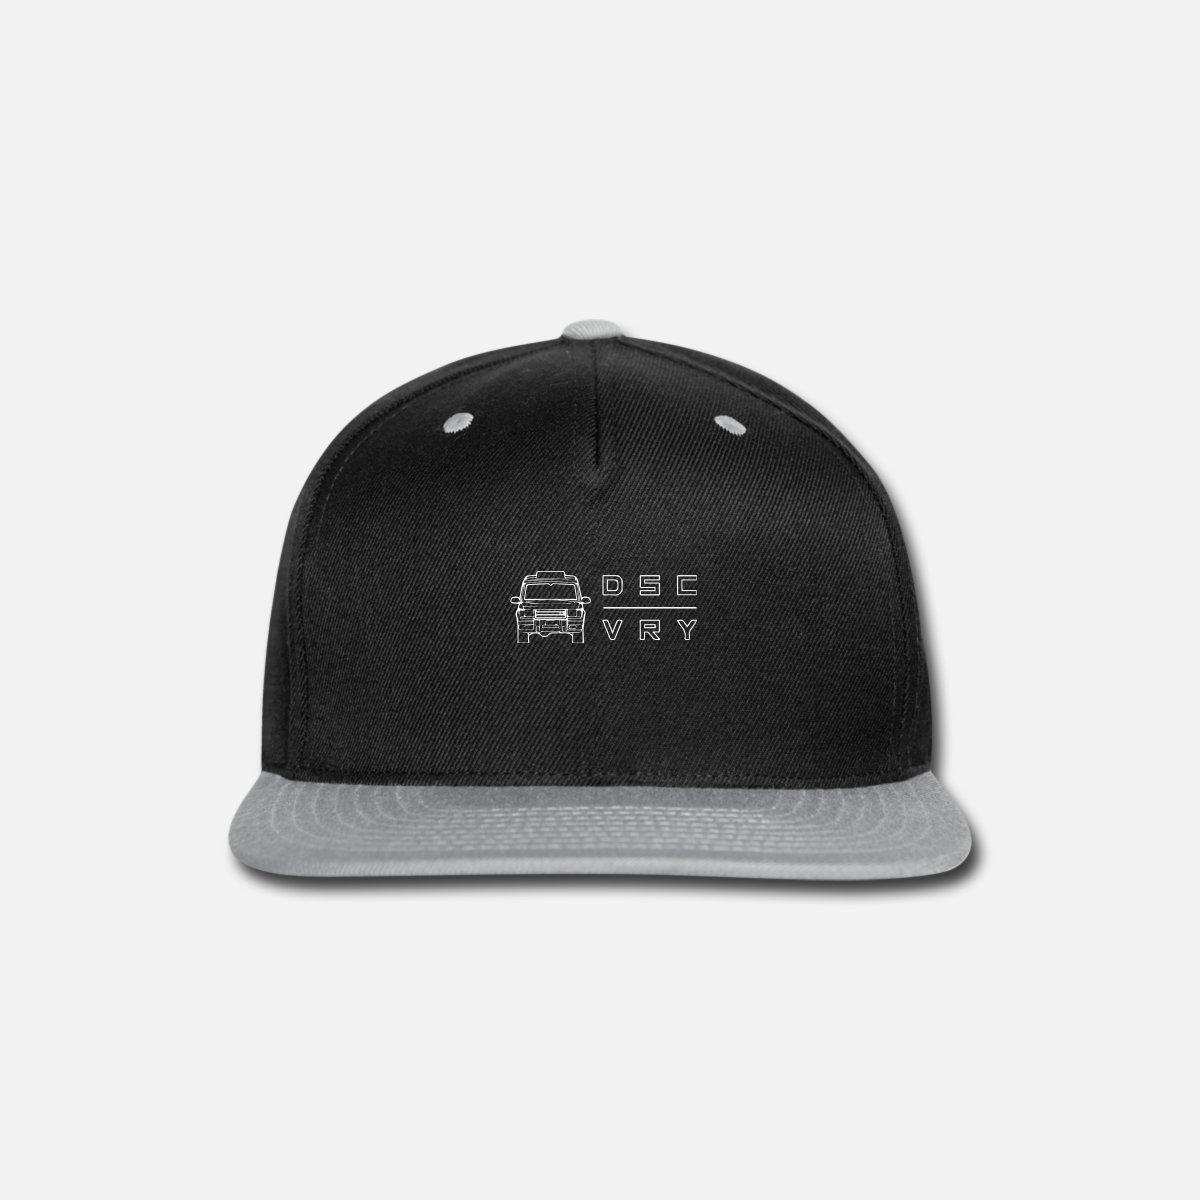 32757bf99 LND RVR Discover Snap-back Baseball Cap - black/gray